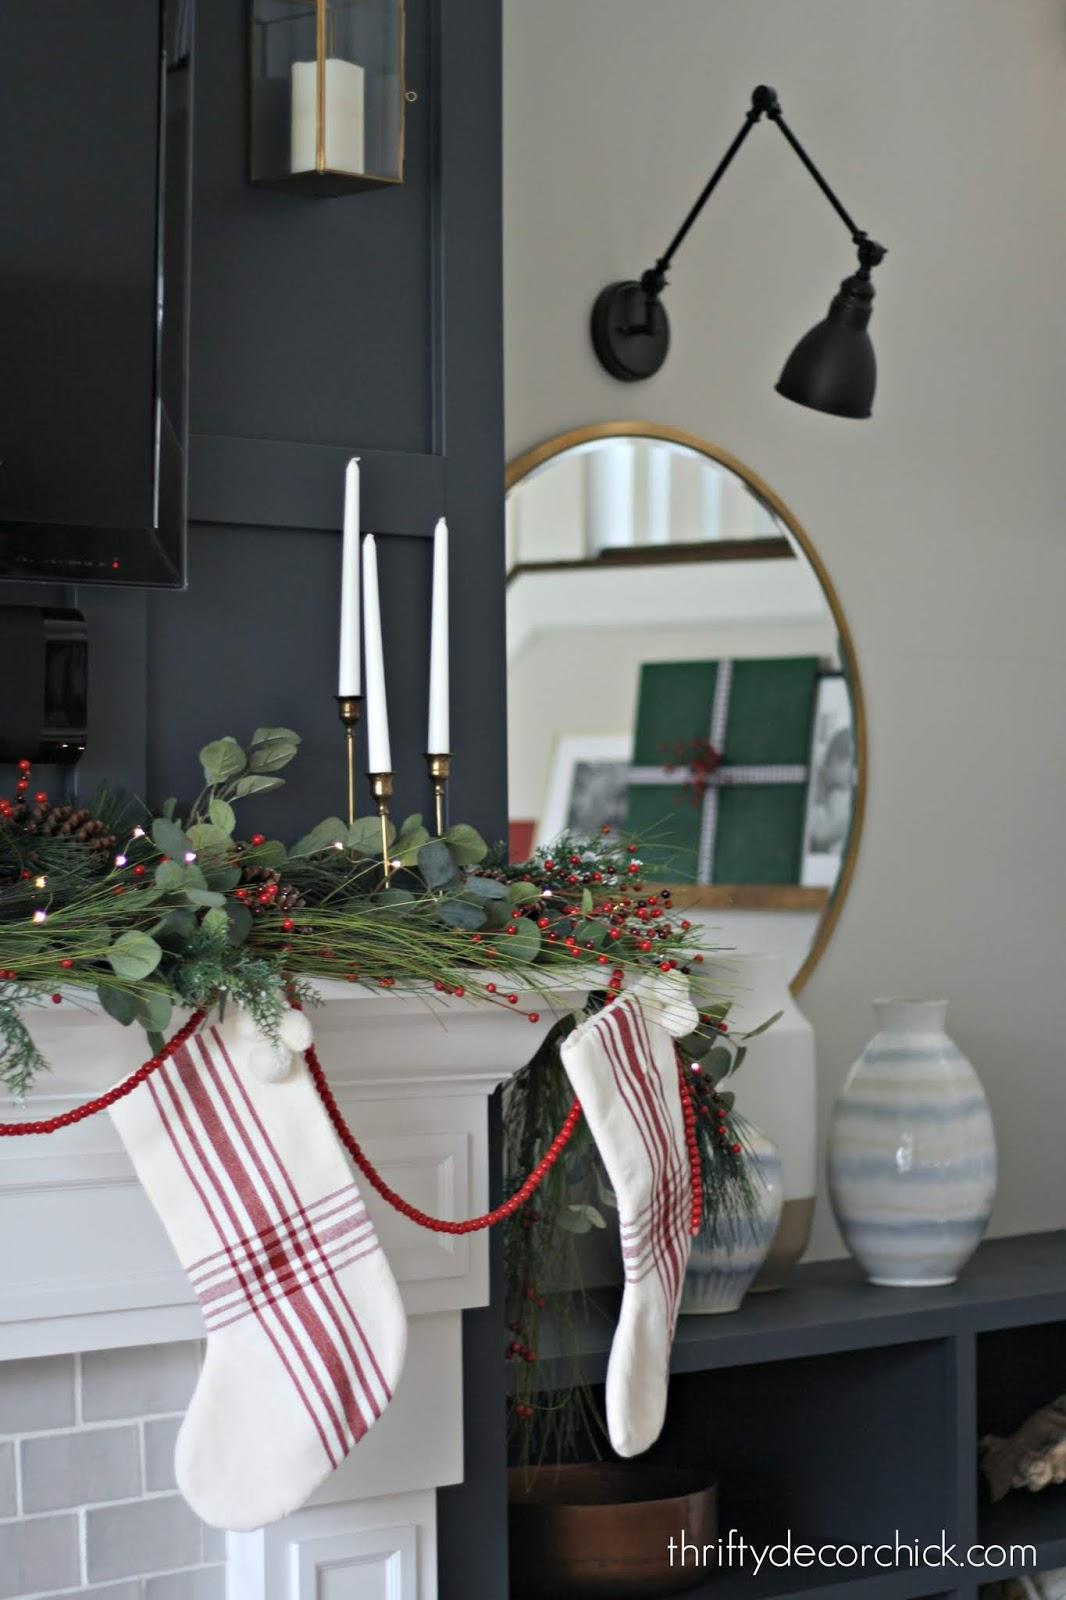 Using garland on Christmas fireplace